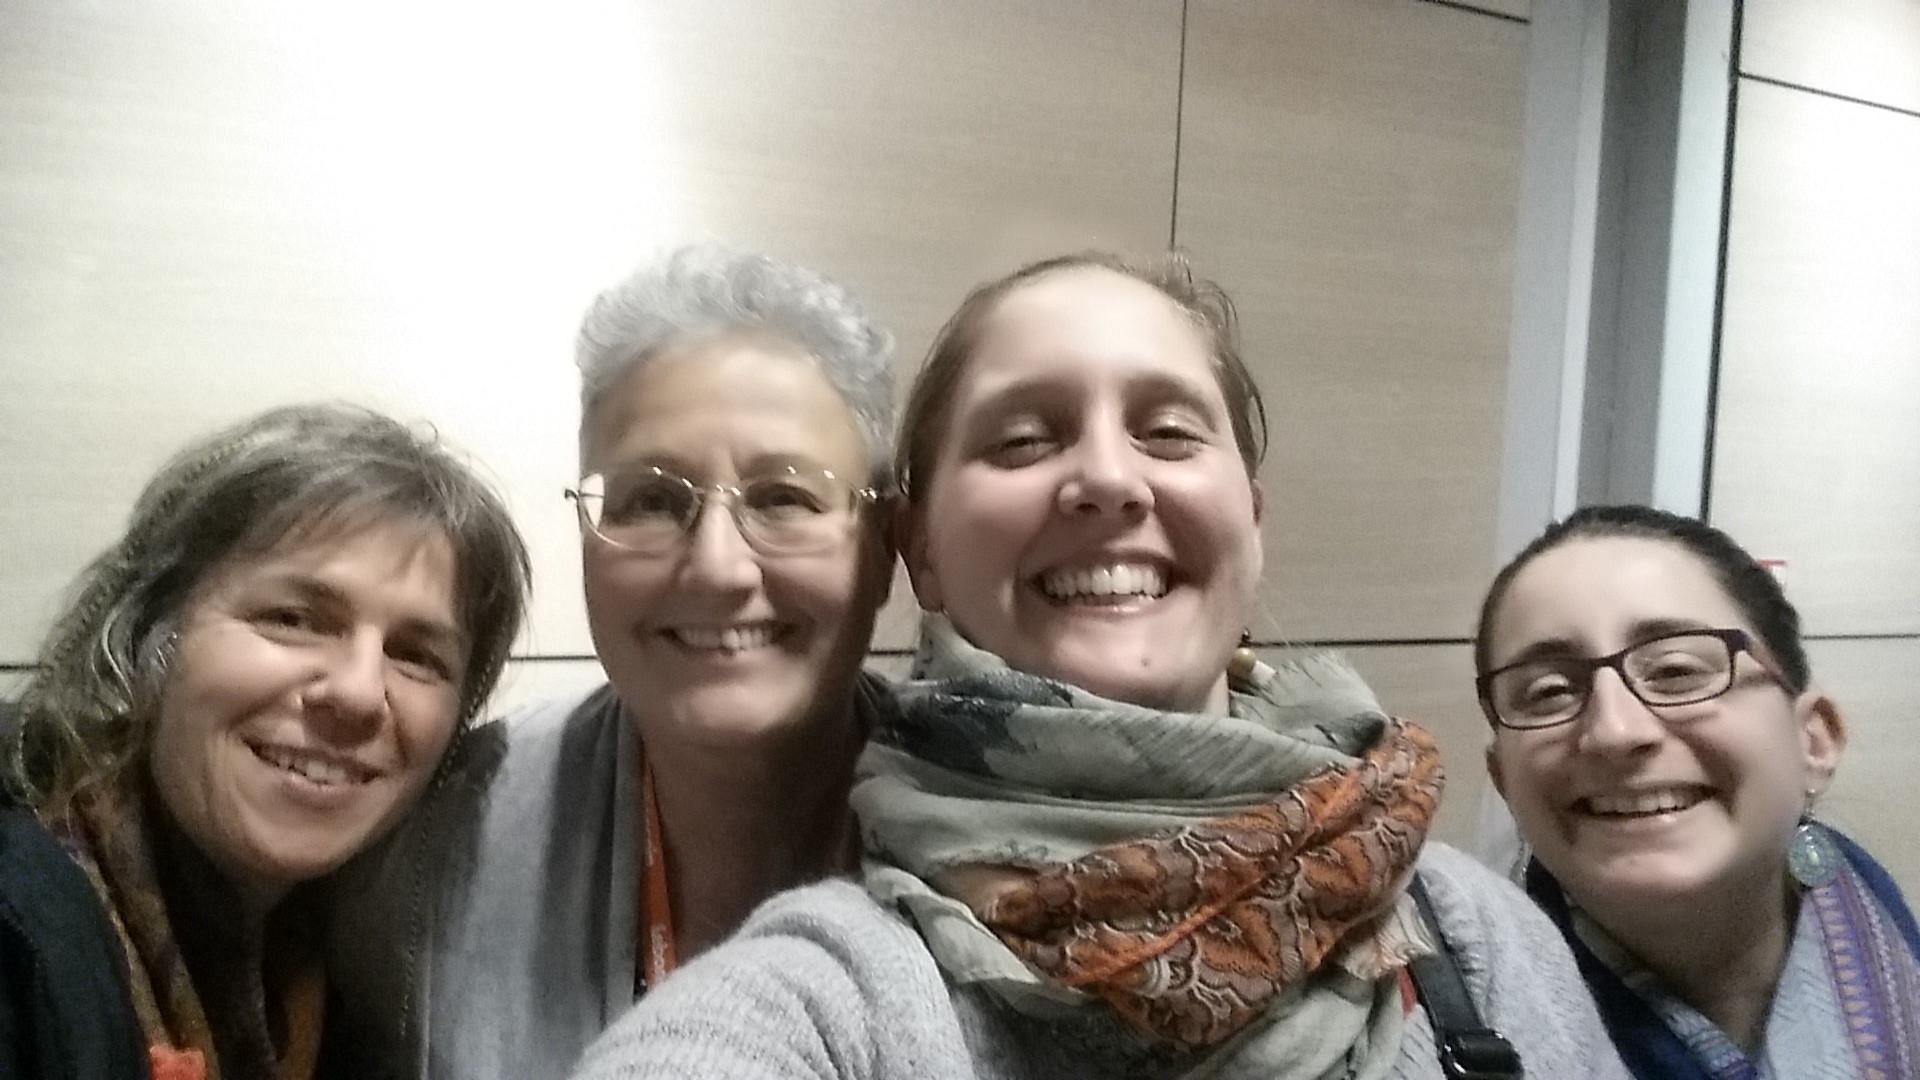 #SDE2017 Delphine Delmas, Muriel Faibes, Emmanuelle Orvain, Anne Delmer-Berhil